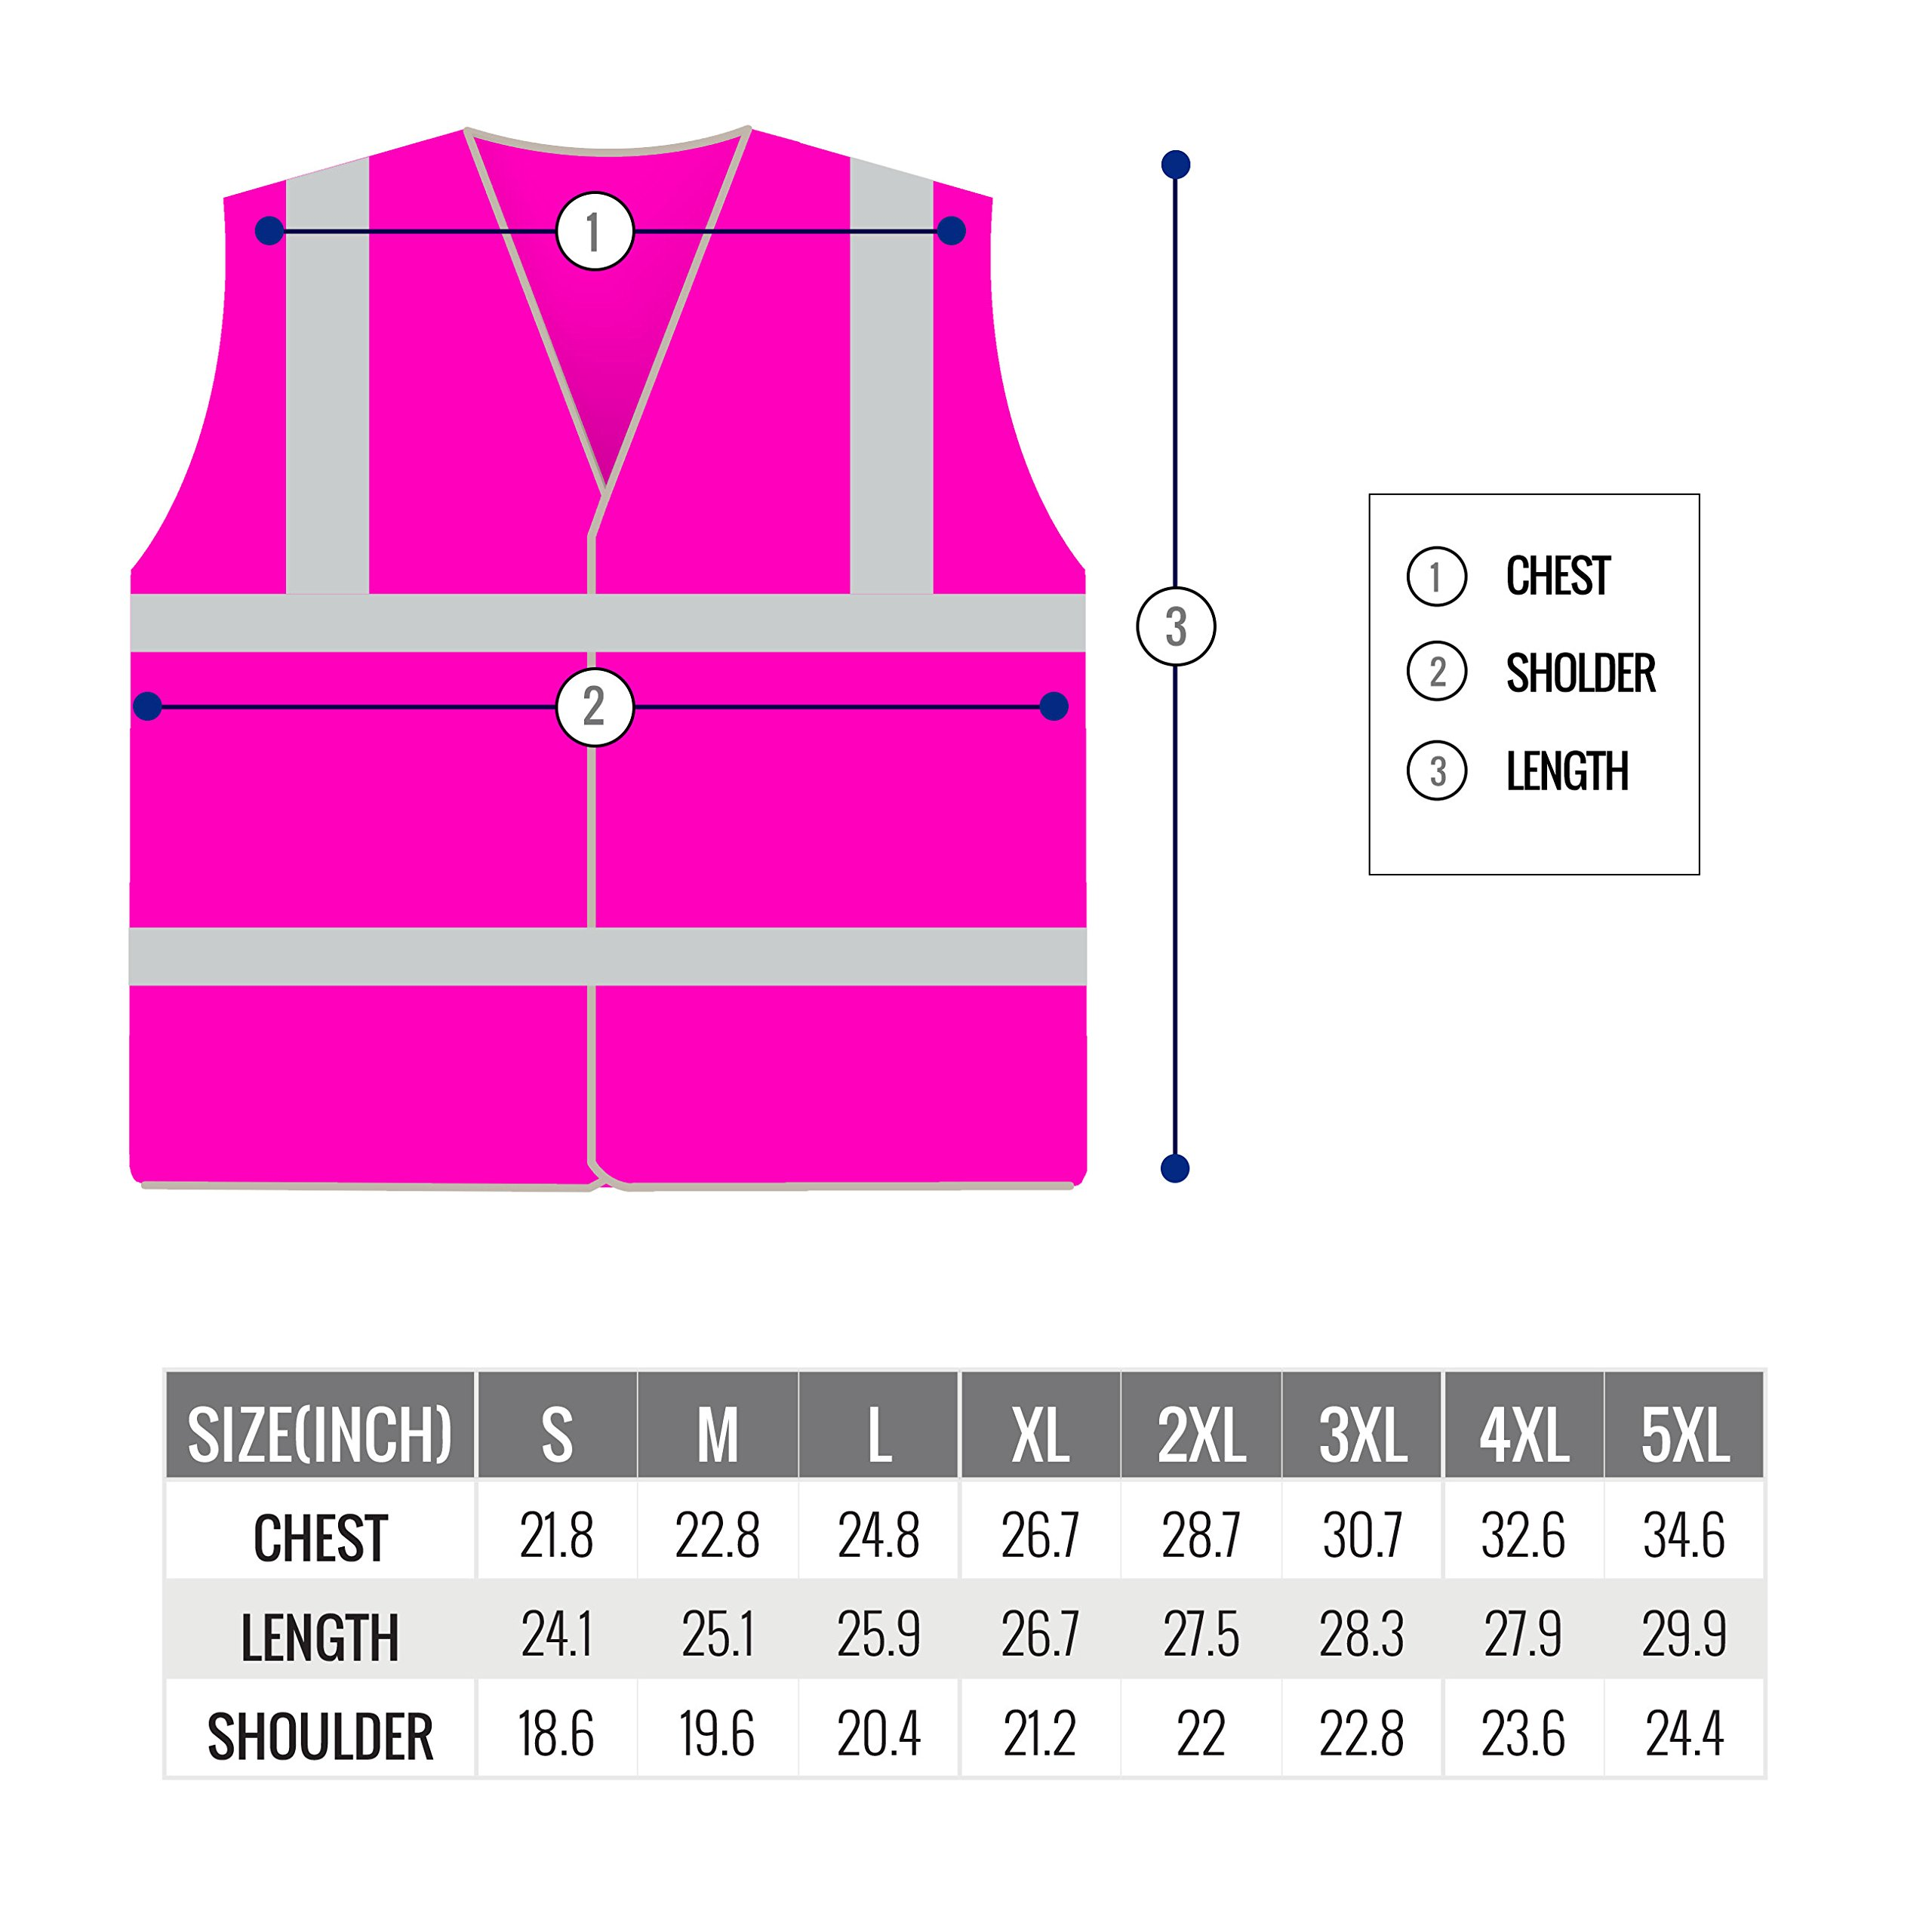 RK Safety PK0430 ANSI/ISEA Class 2 Certified Female Safety Vest (Pink, Medium) by New York Hi-Viz Workwear (Image #4)